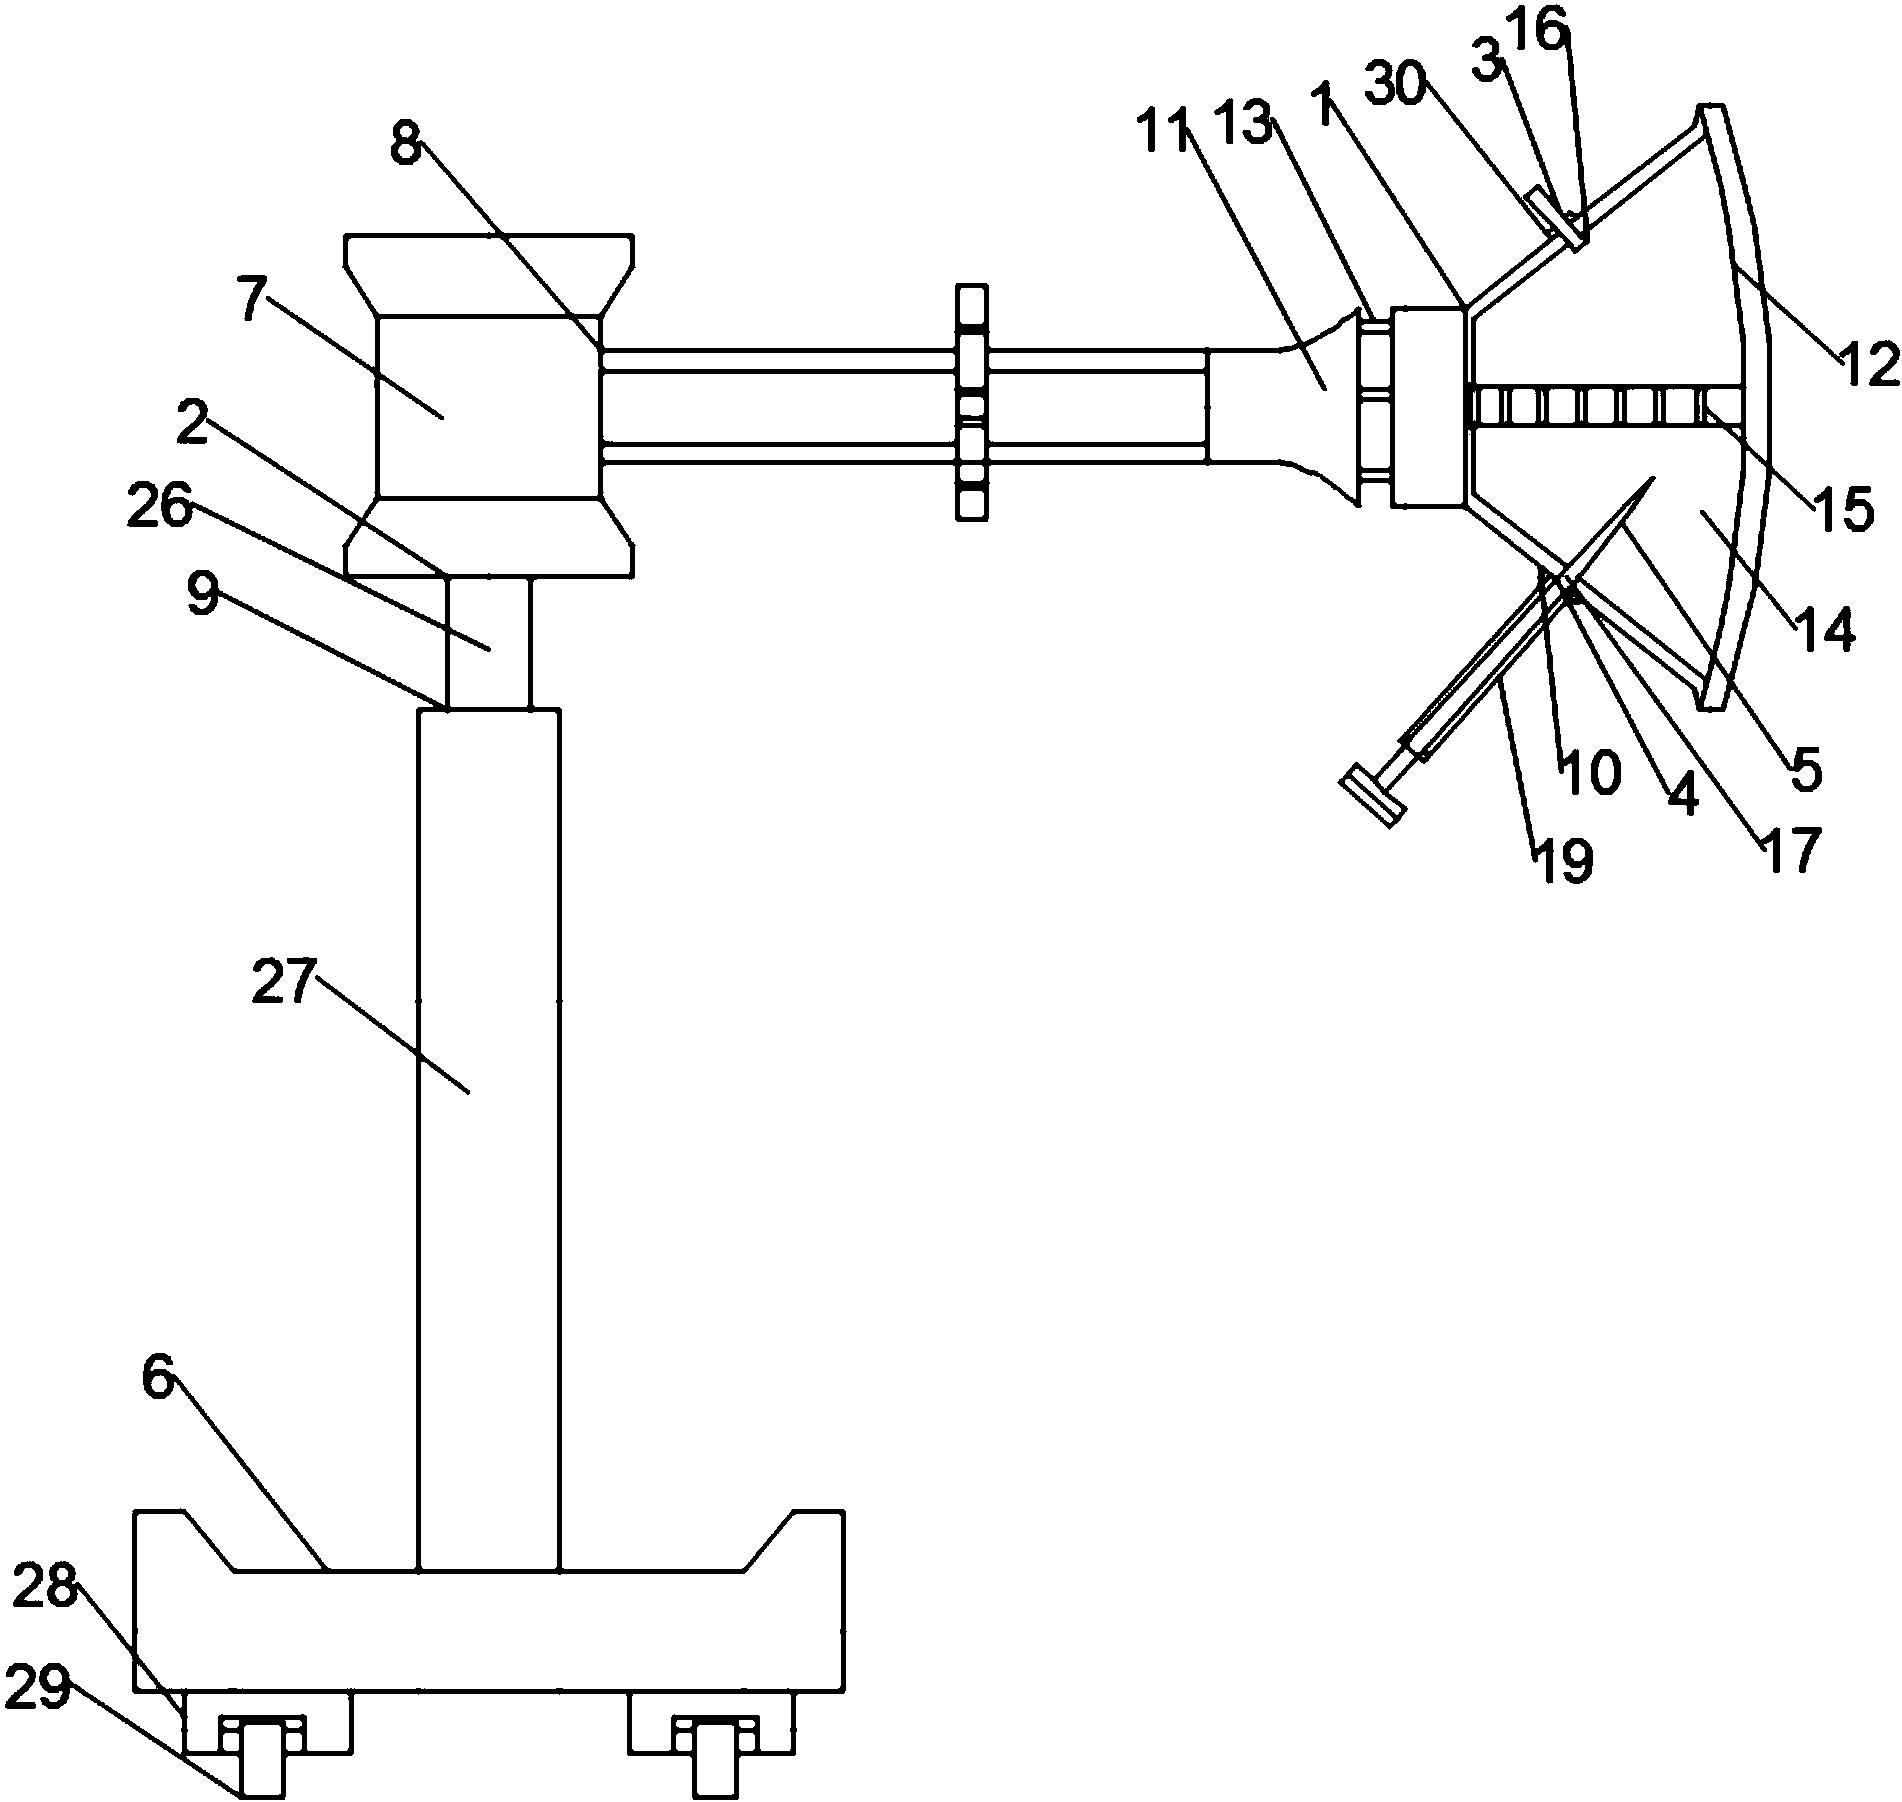 cn207506620u_一种超声引导乳腺穿刺导向器有效